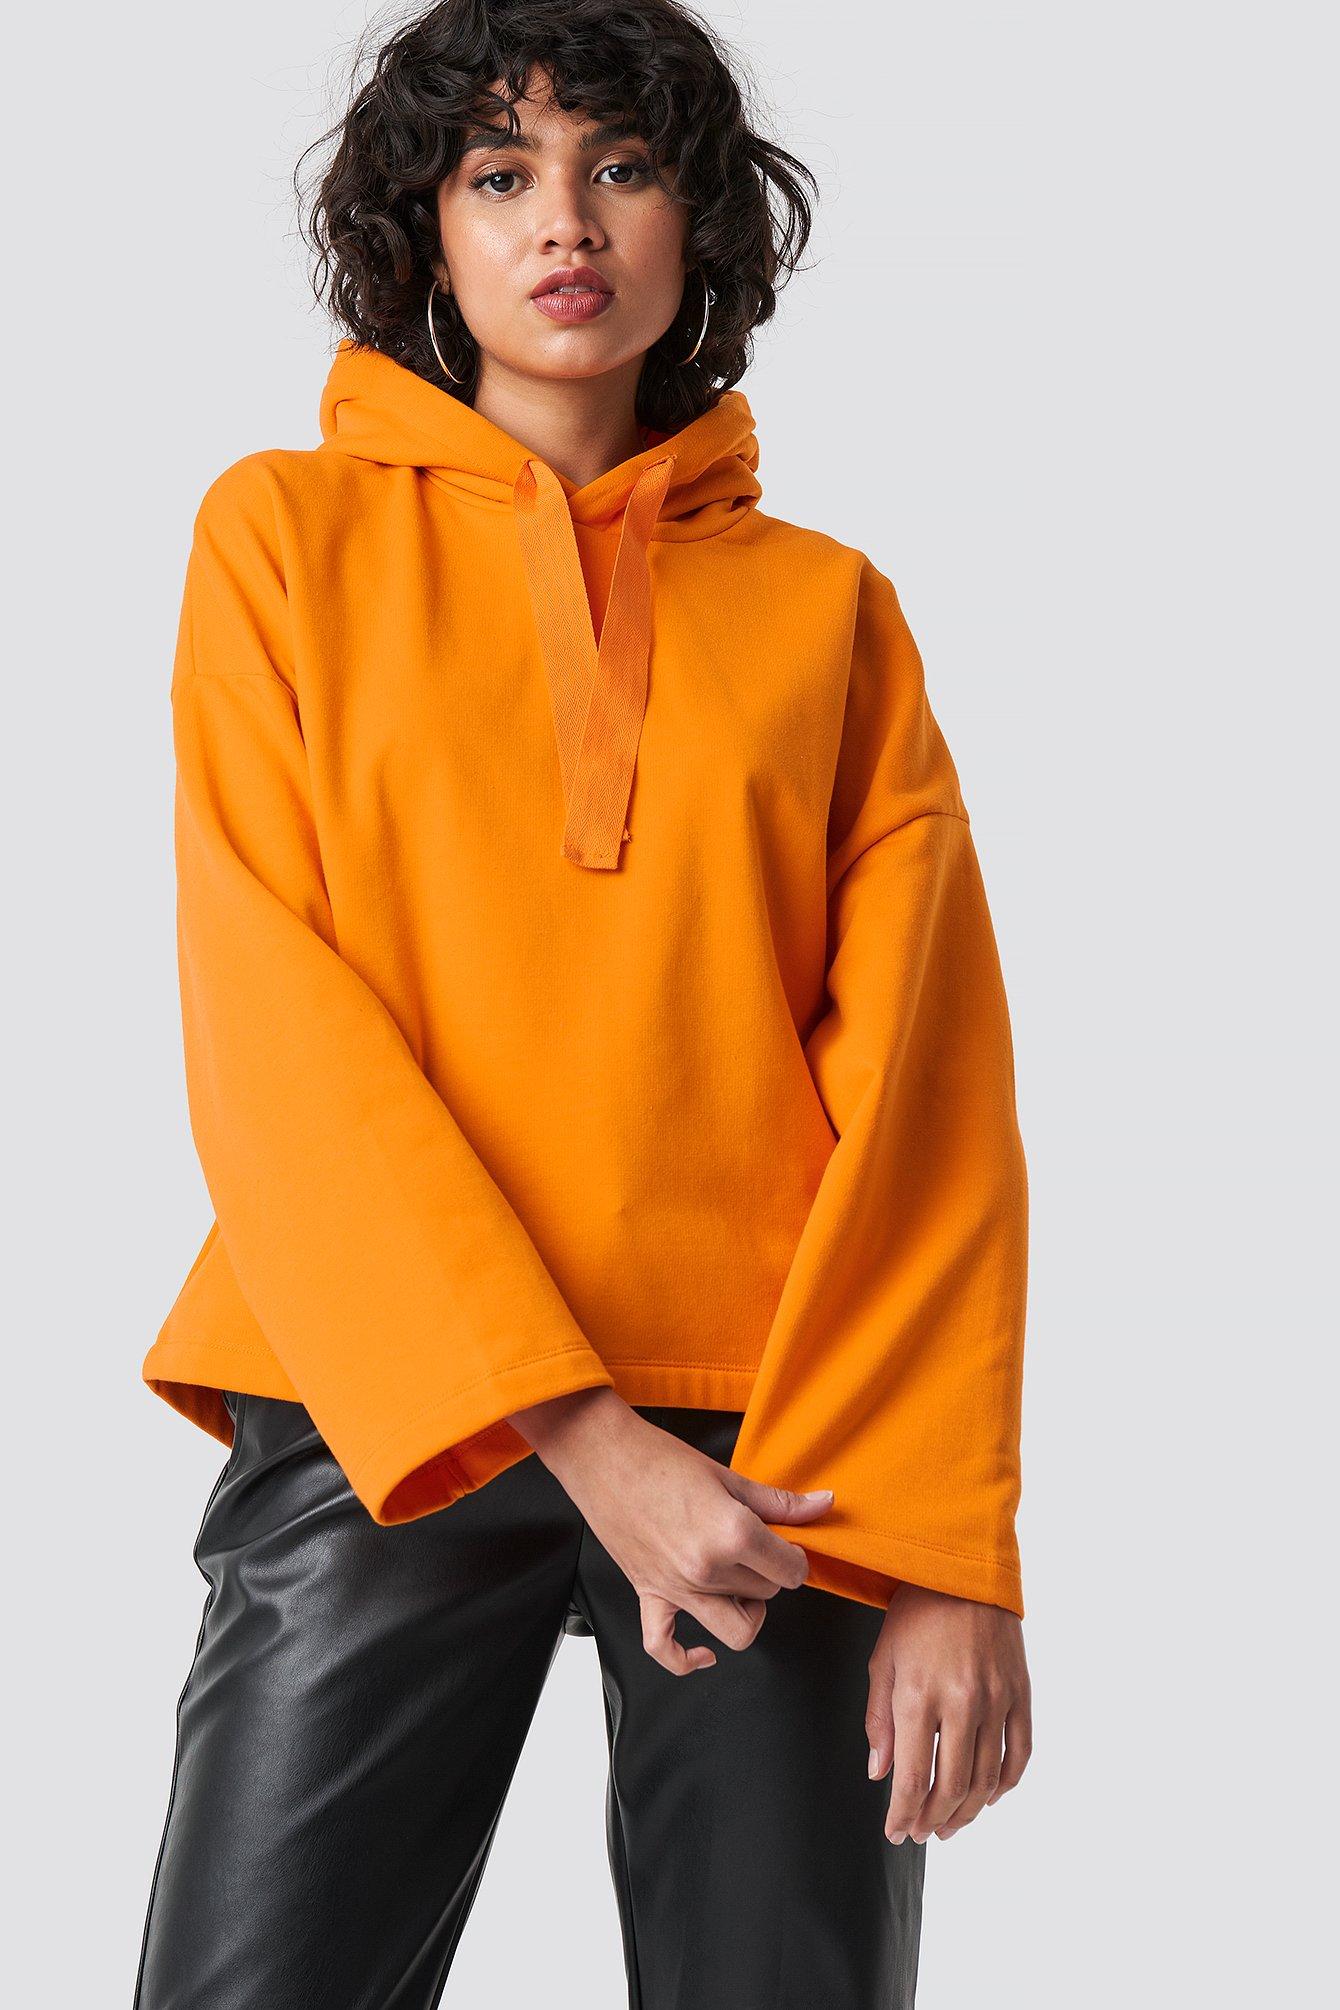 moves -  Tiala Sweatshirt - Orange